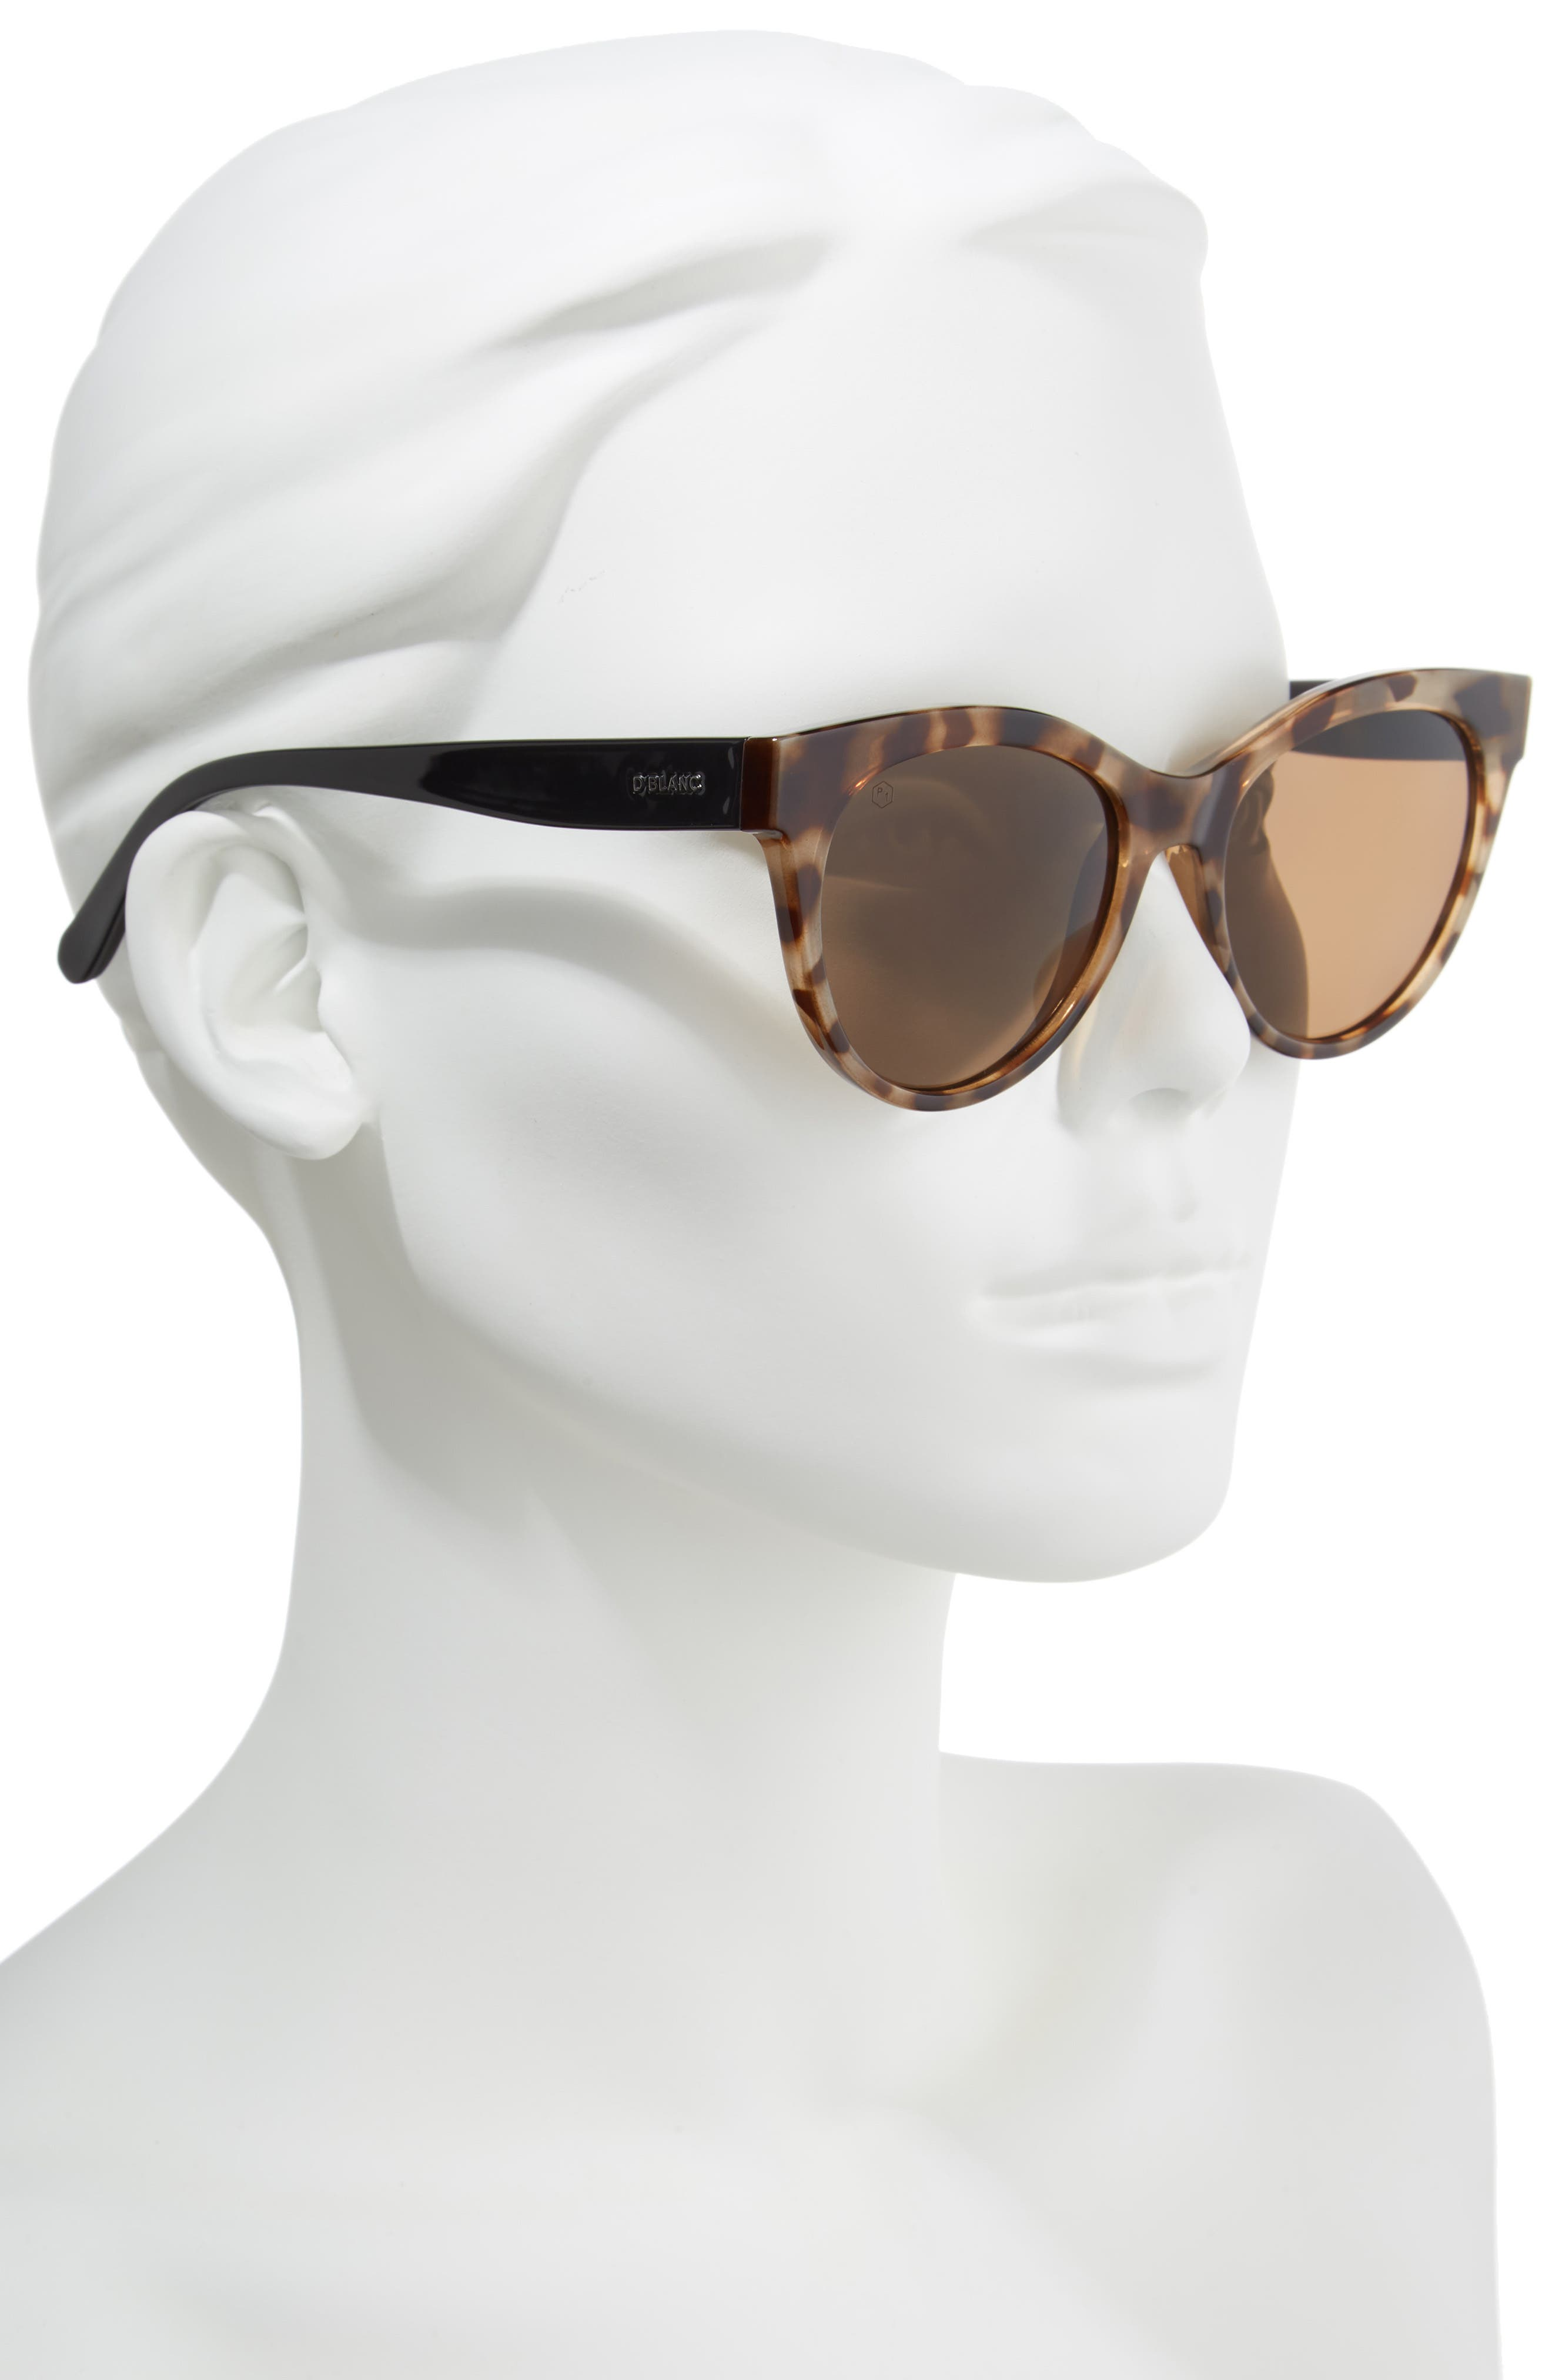 D'BLANC Felicity 54mm Polarized Sunglasses,                             Alternate thumbnail 2, color,                             200